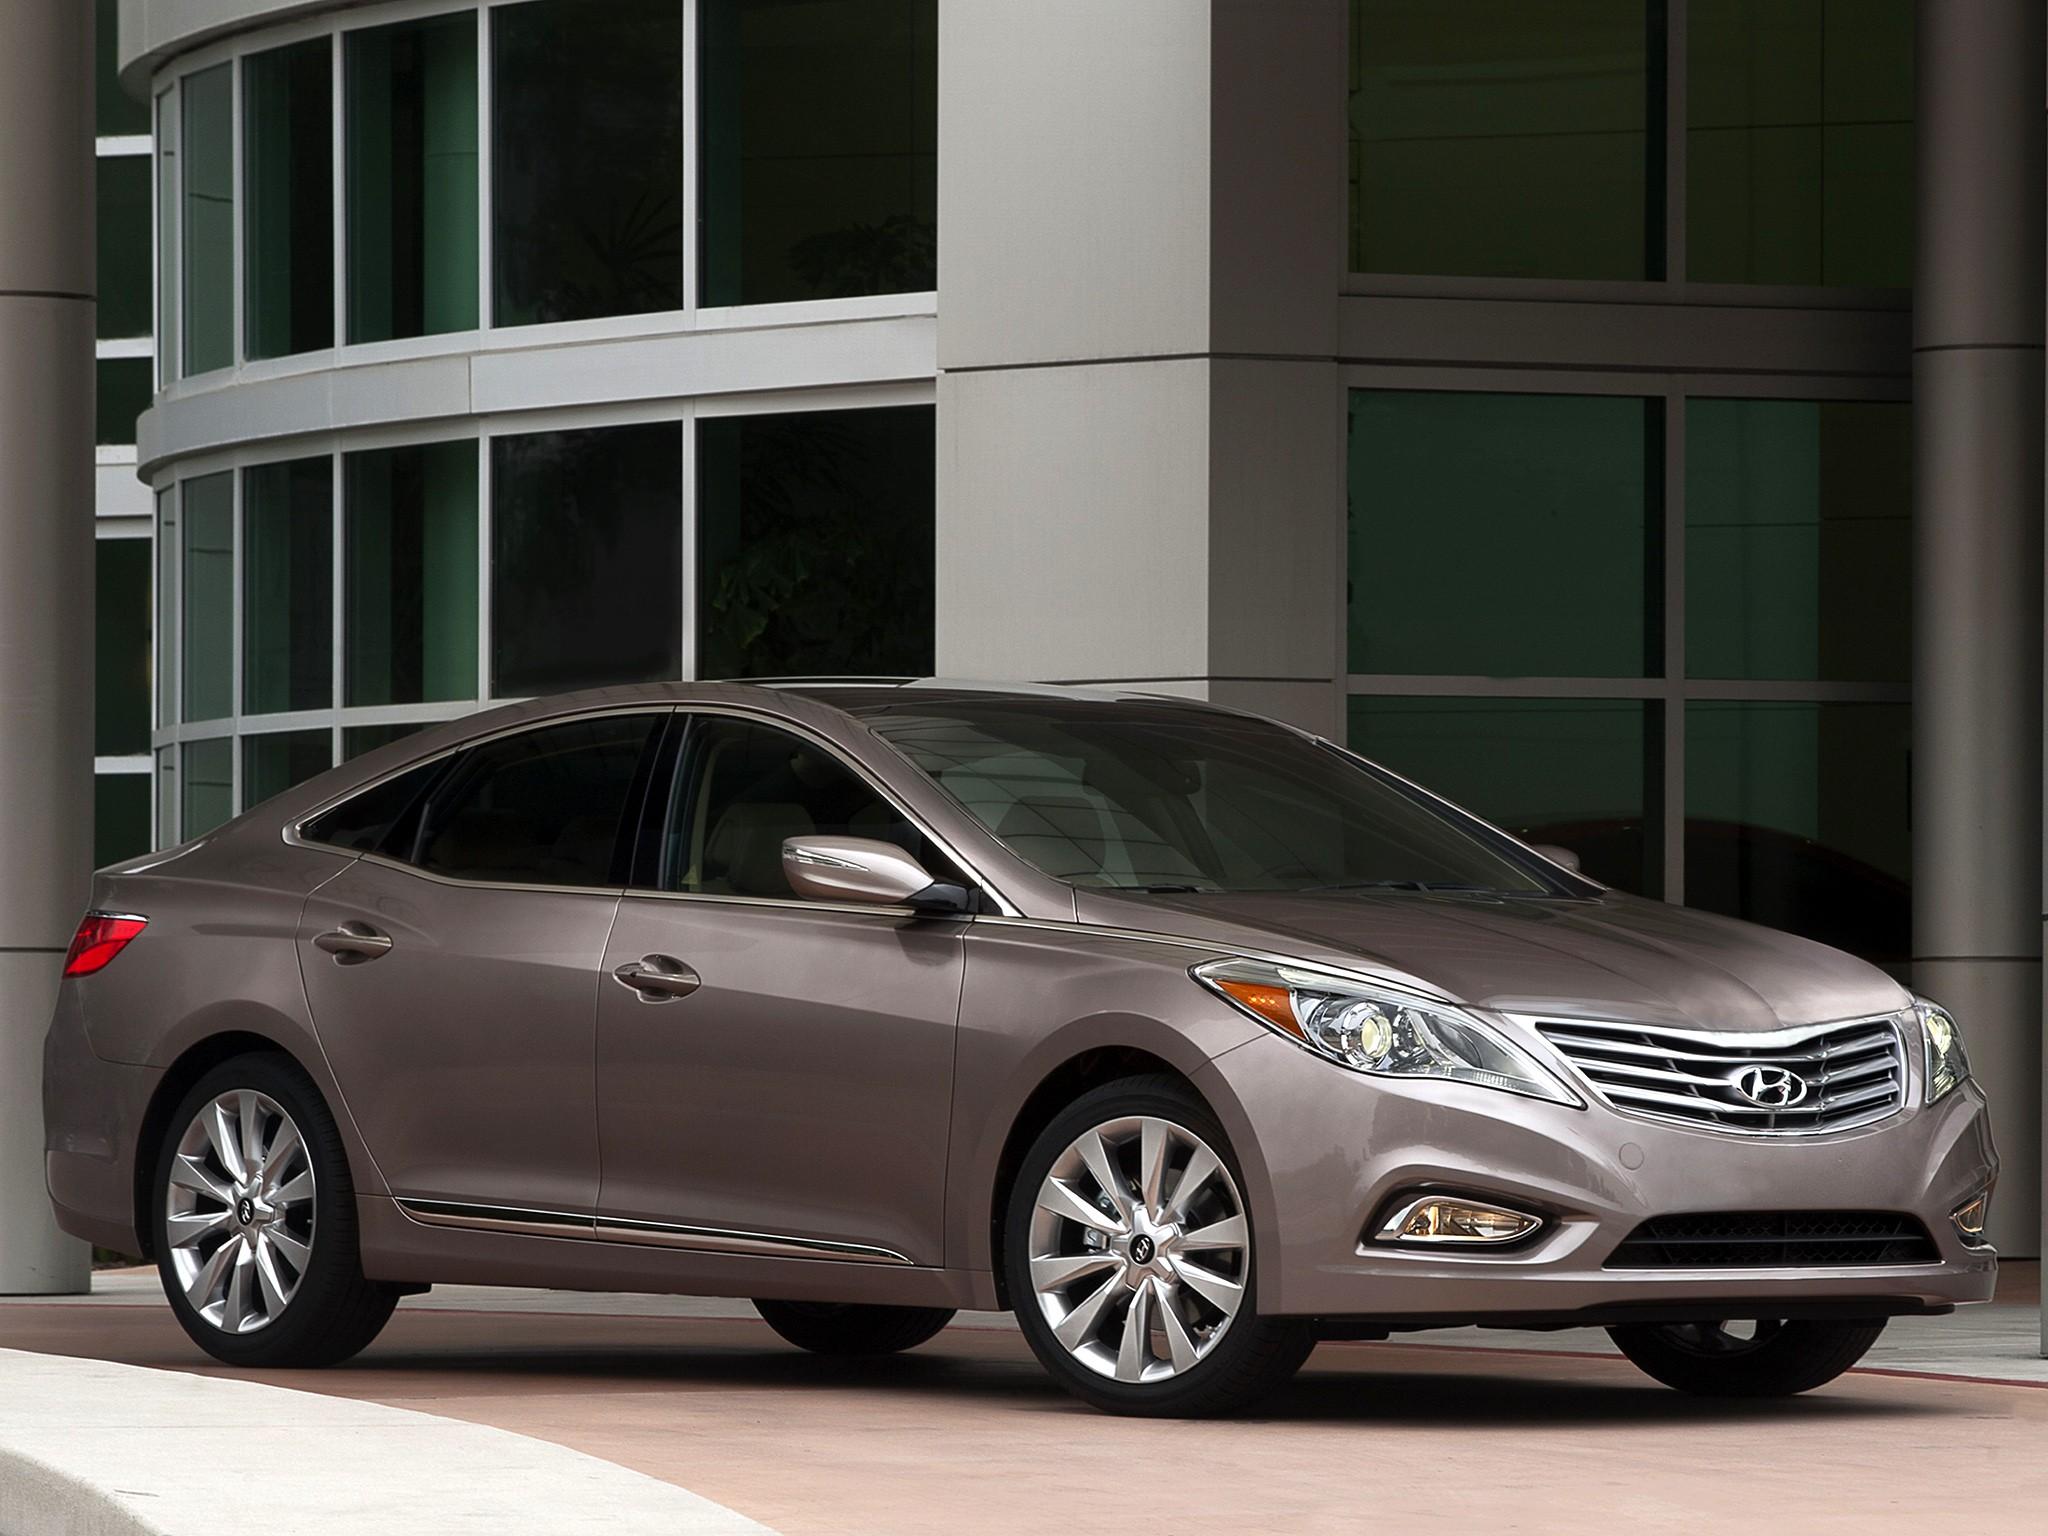 Hyundai Azera Specs 2012 2013 2014 2015 2016 2017